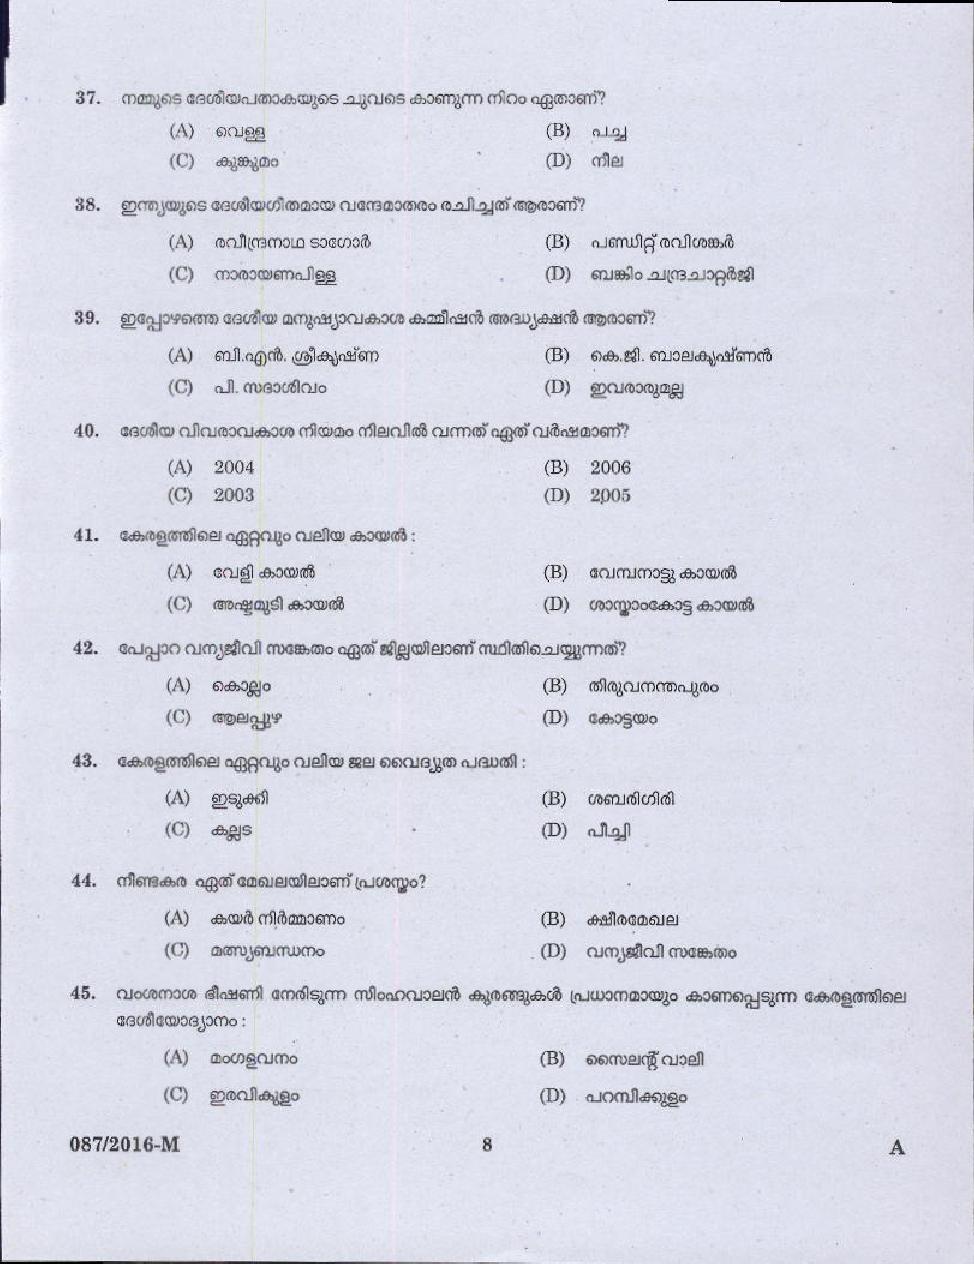 http://masterstudy.net//pdf/psc/village-extension-officer-gr-ii-rural-development/q_0872016-m0006.jpg